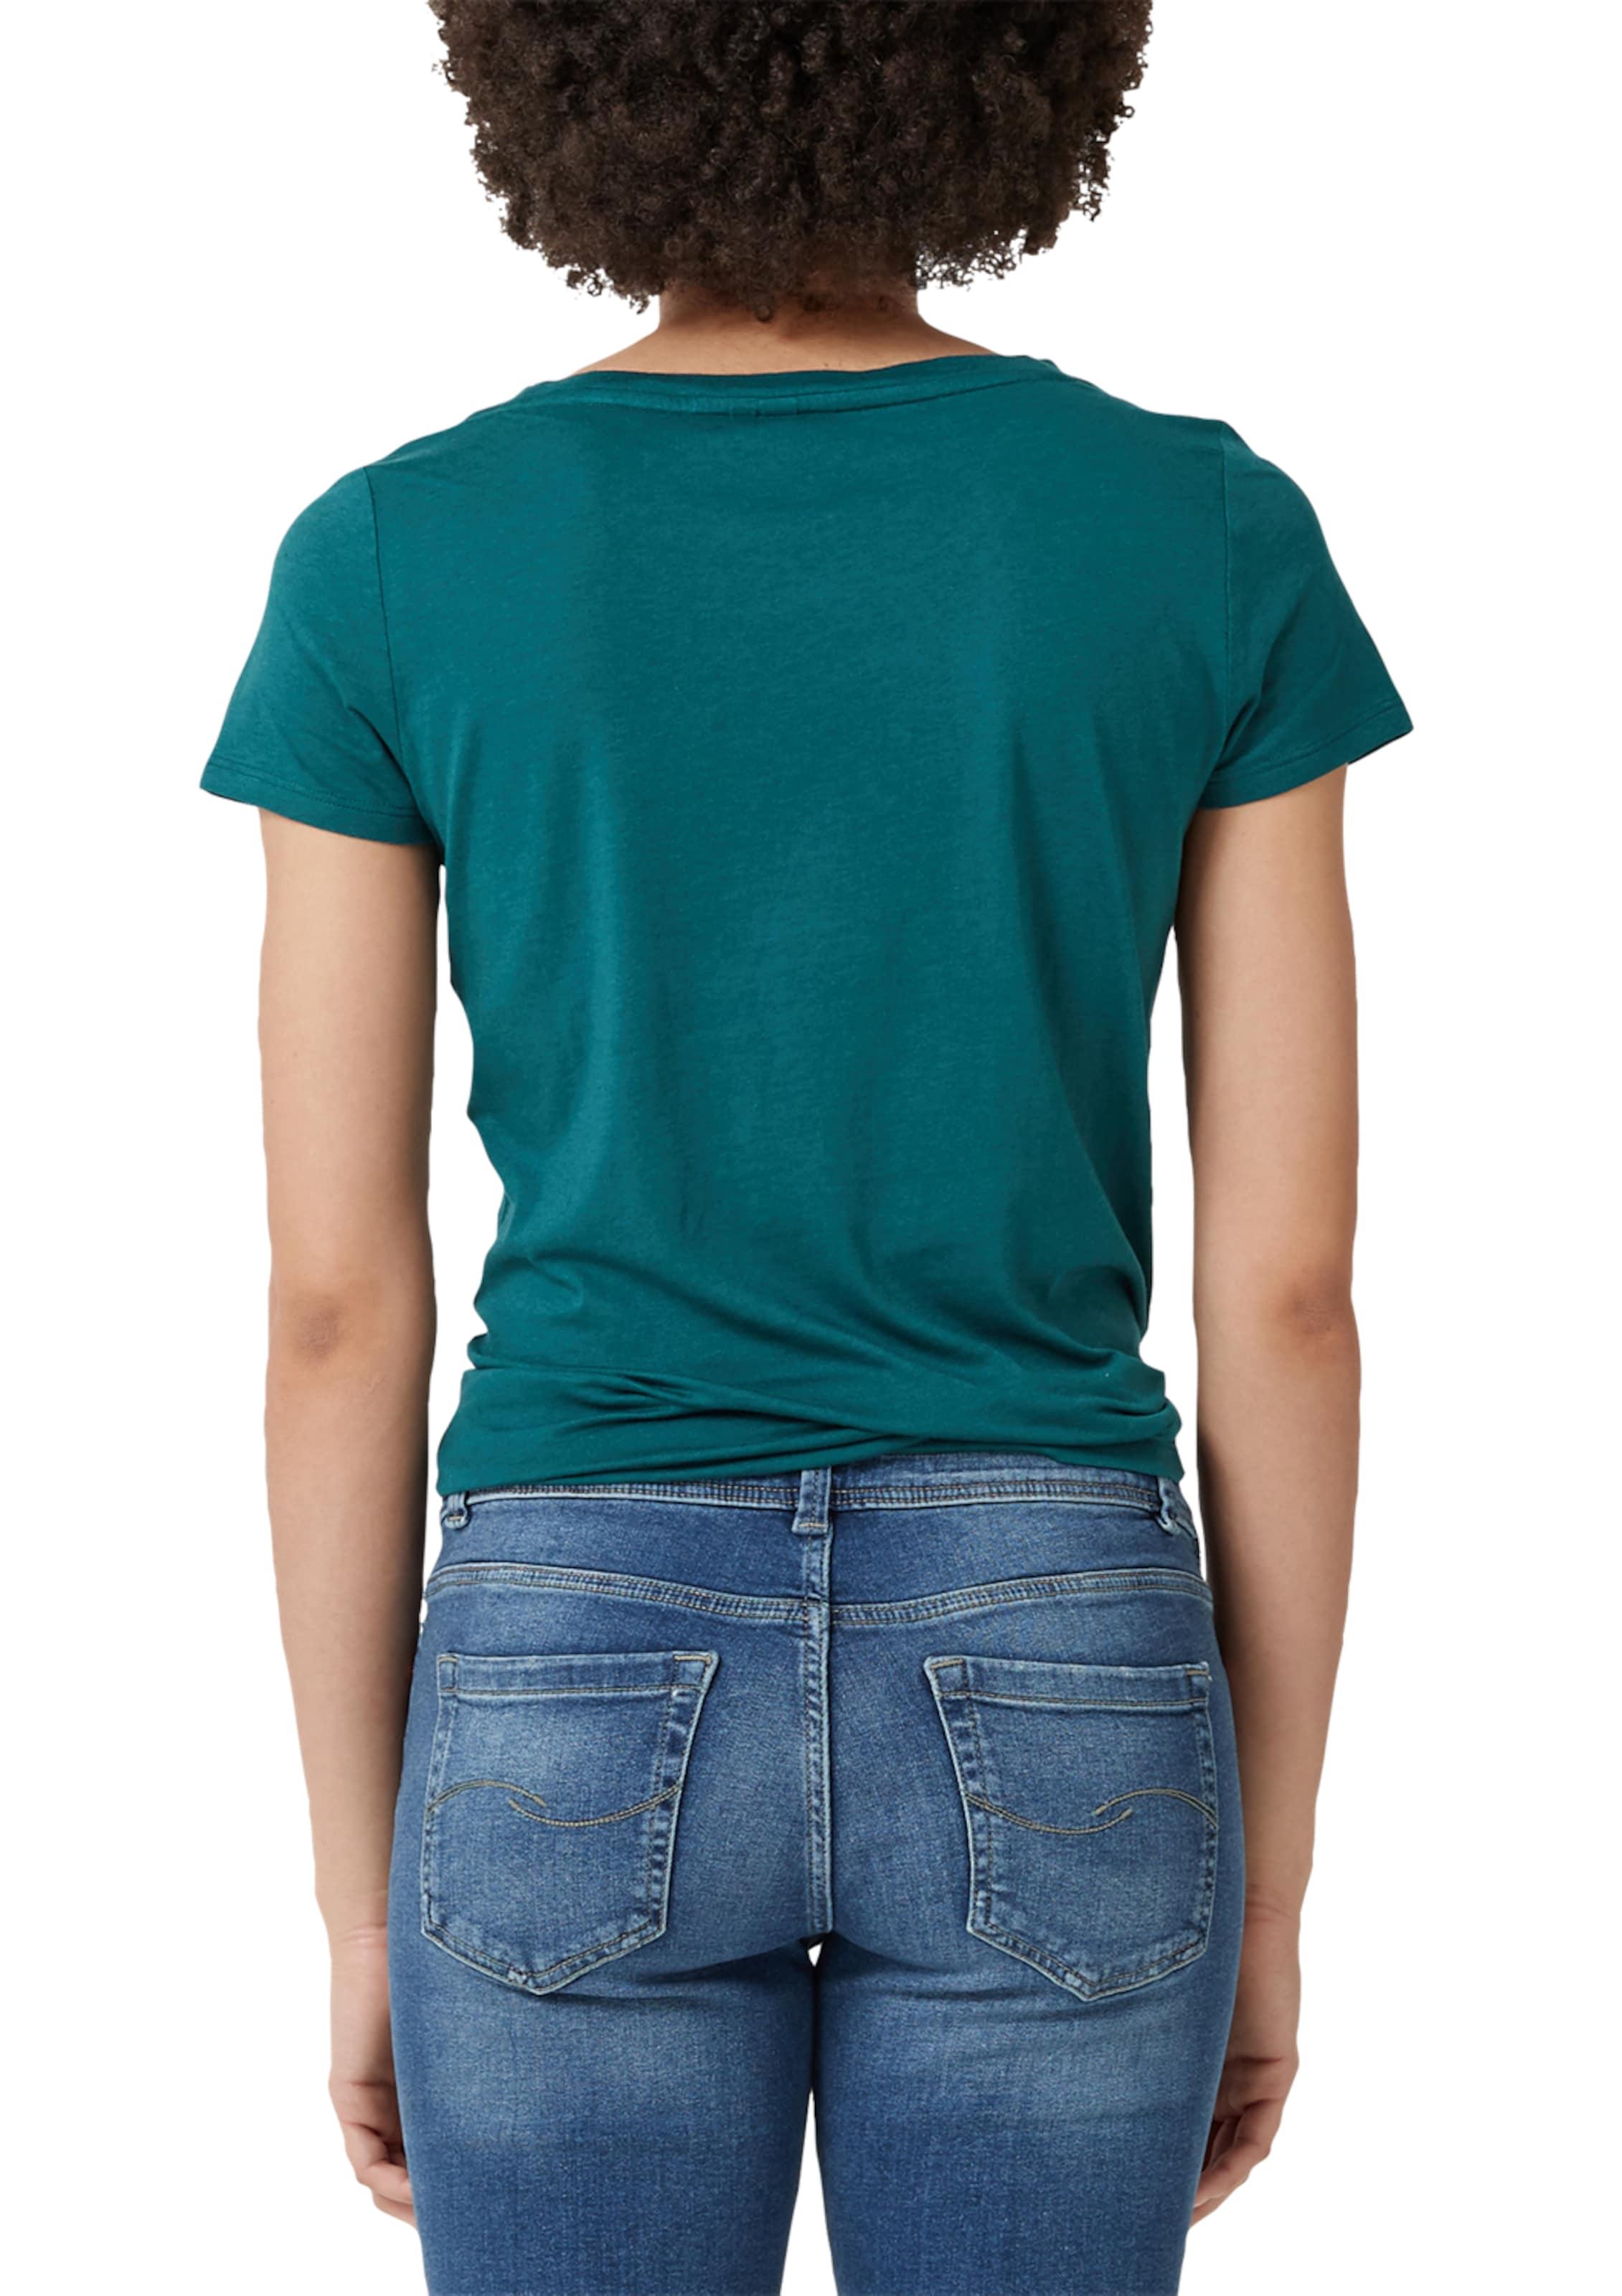 In Q Shirt s Petrol Designed By XPuOZki